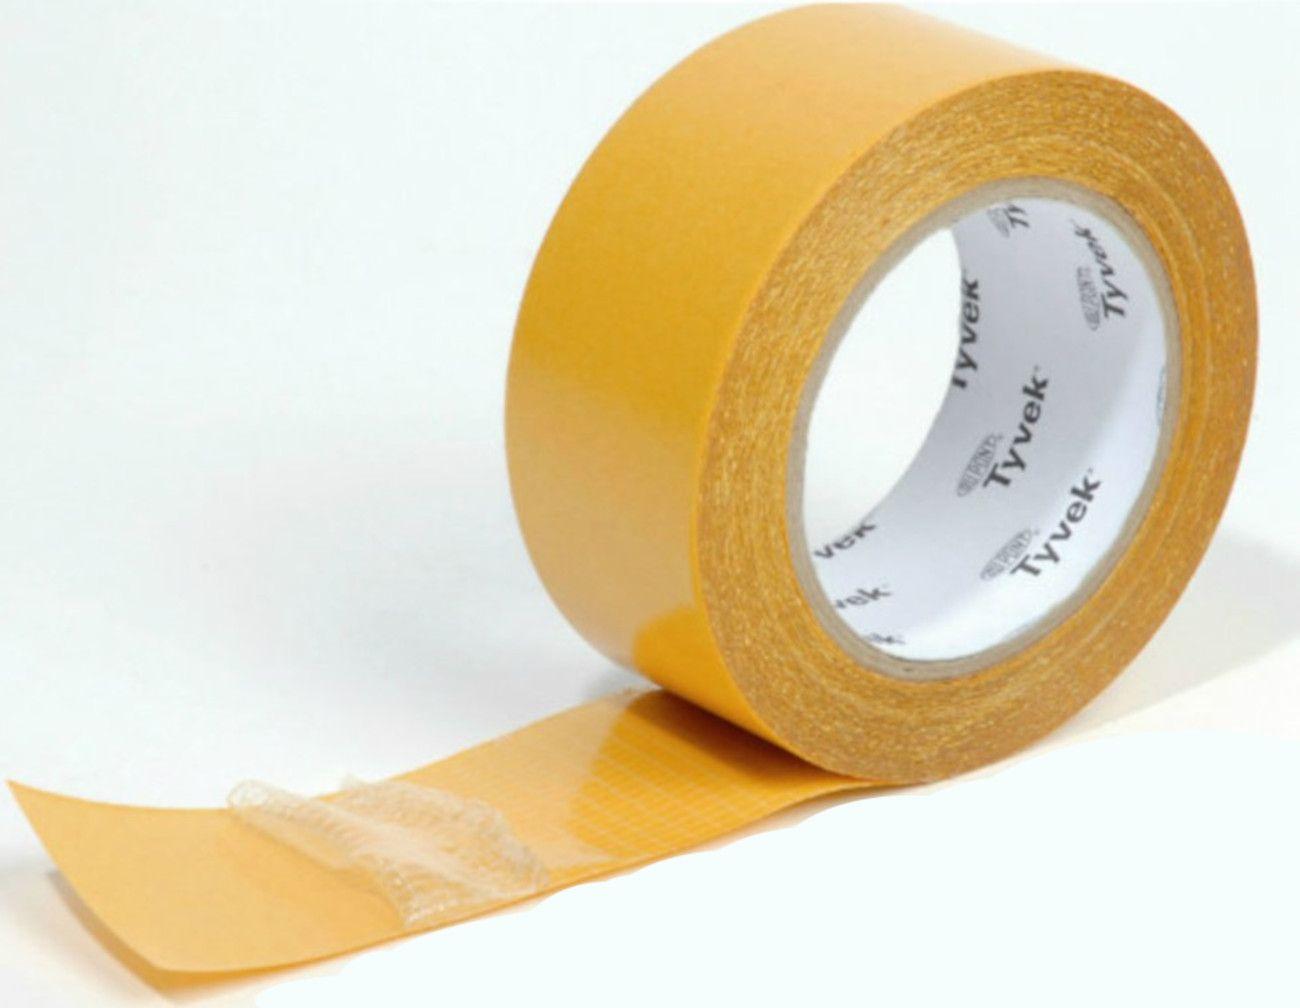 Tyvek House Wrap Tape (50mm x 25m)